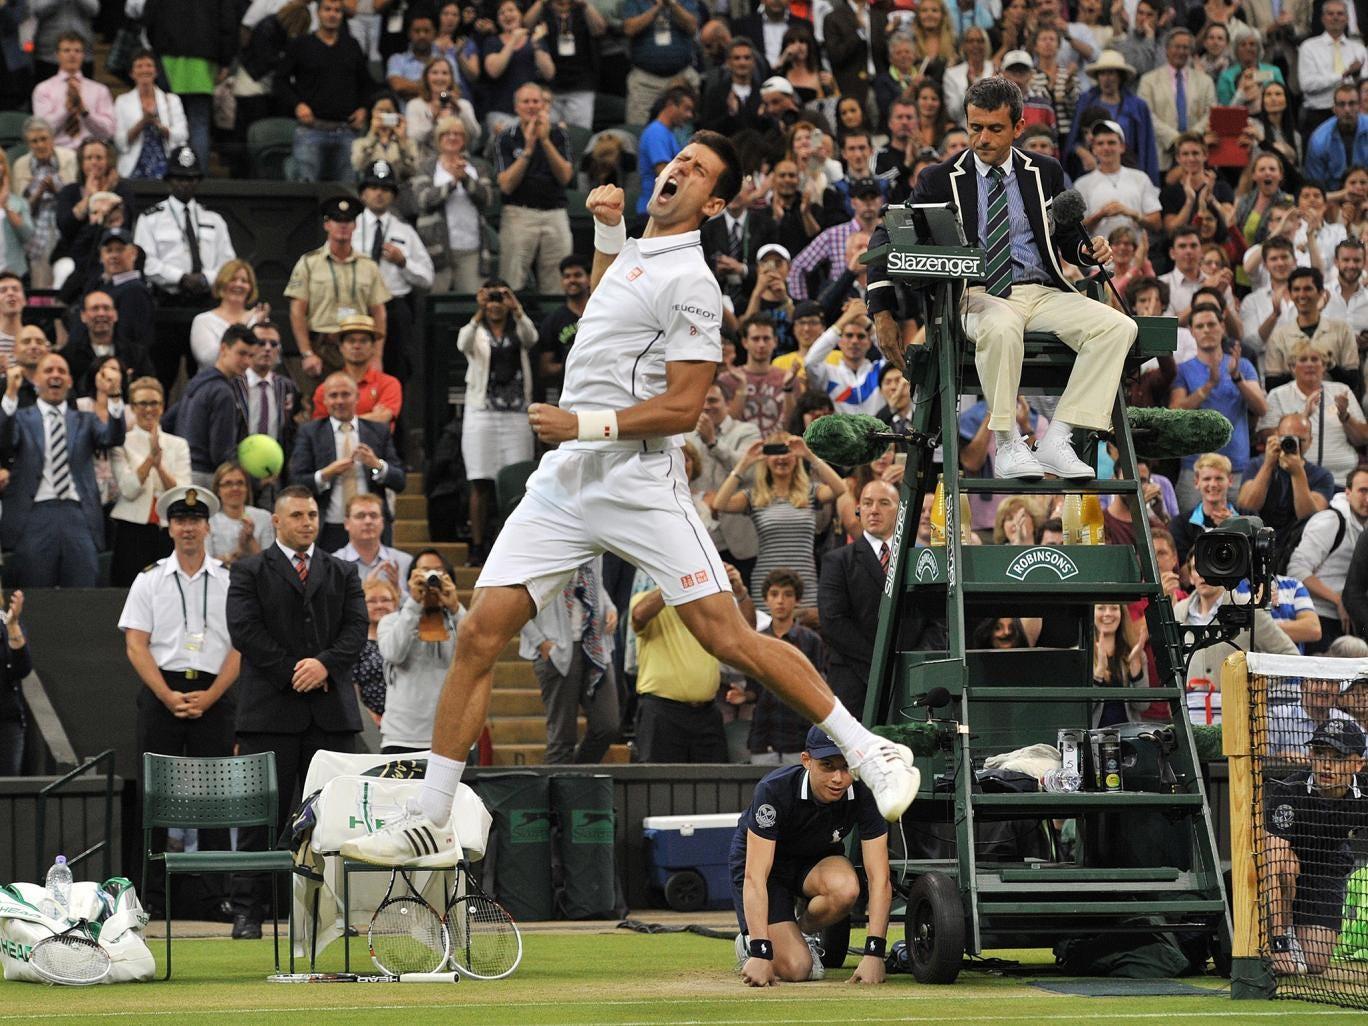 Novak Djokovic celebrates his win over Jo-Wilfried Tsonga